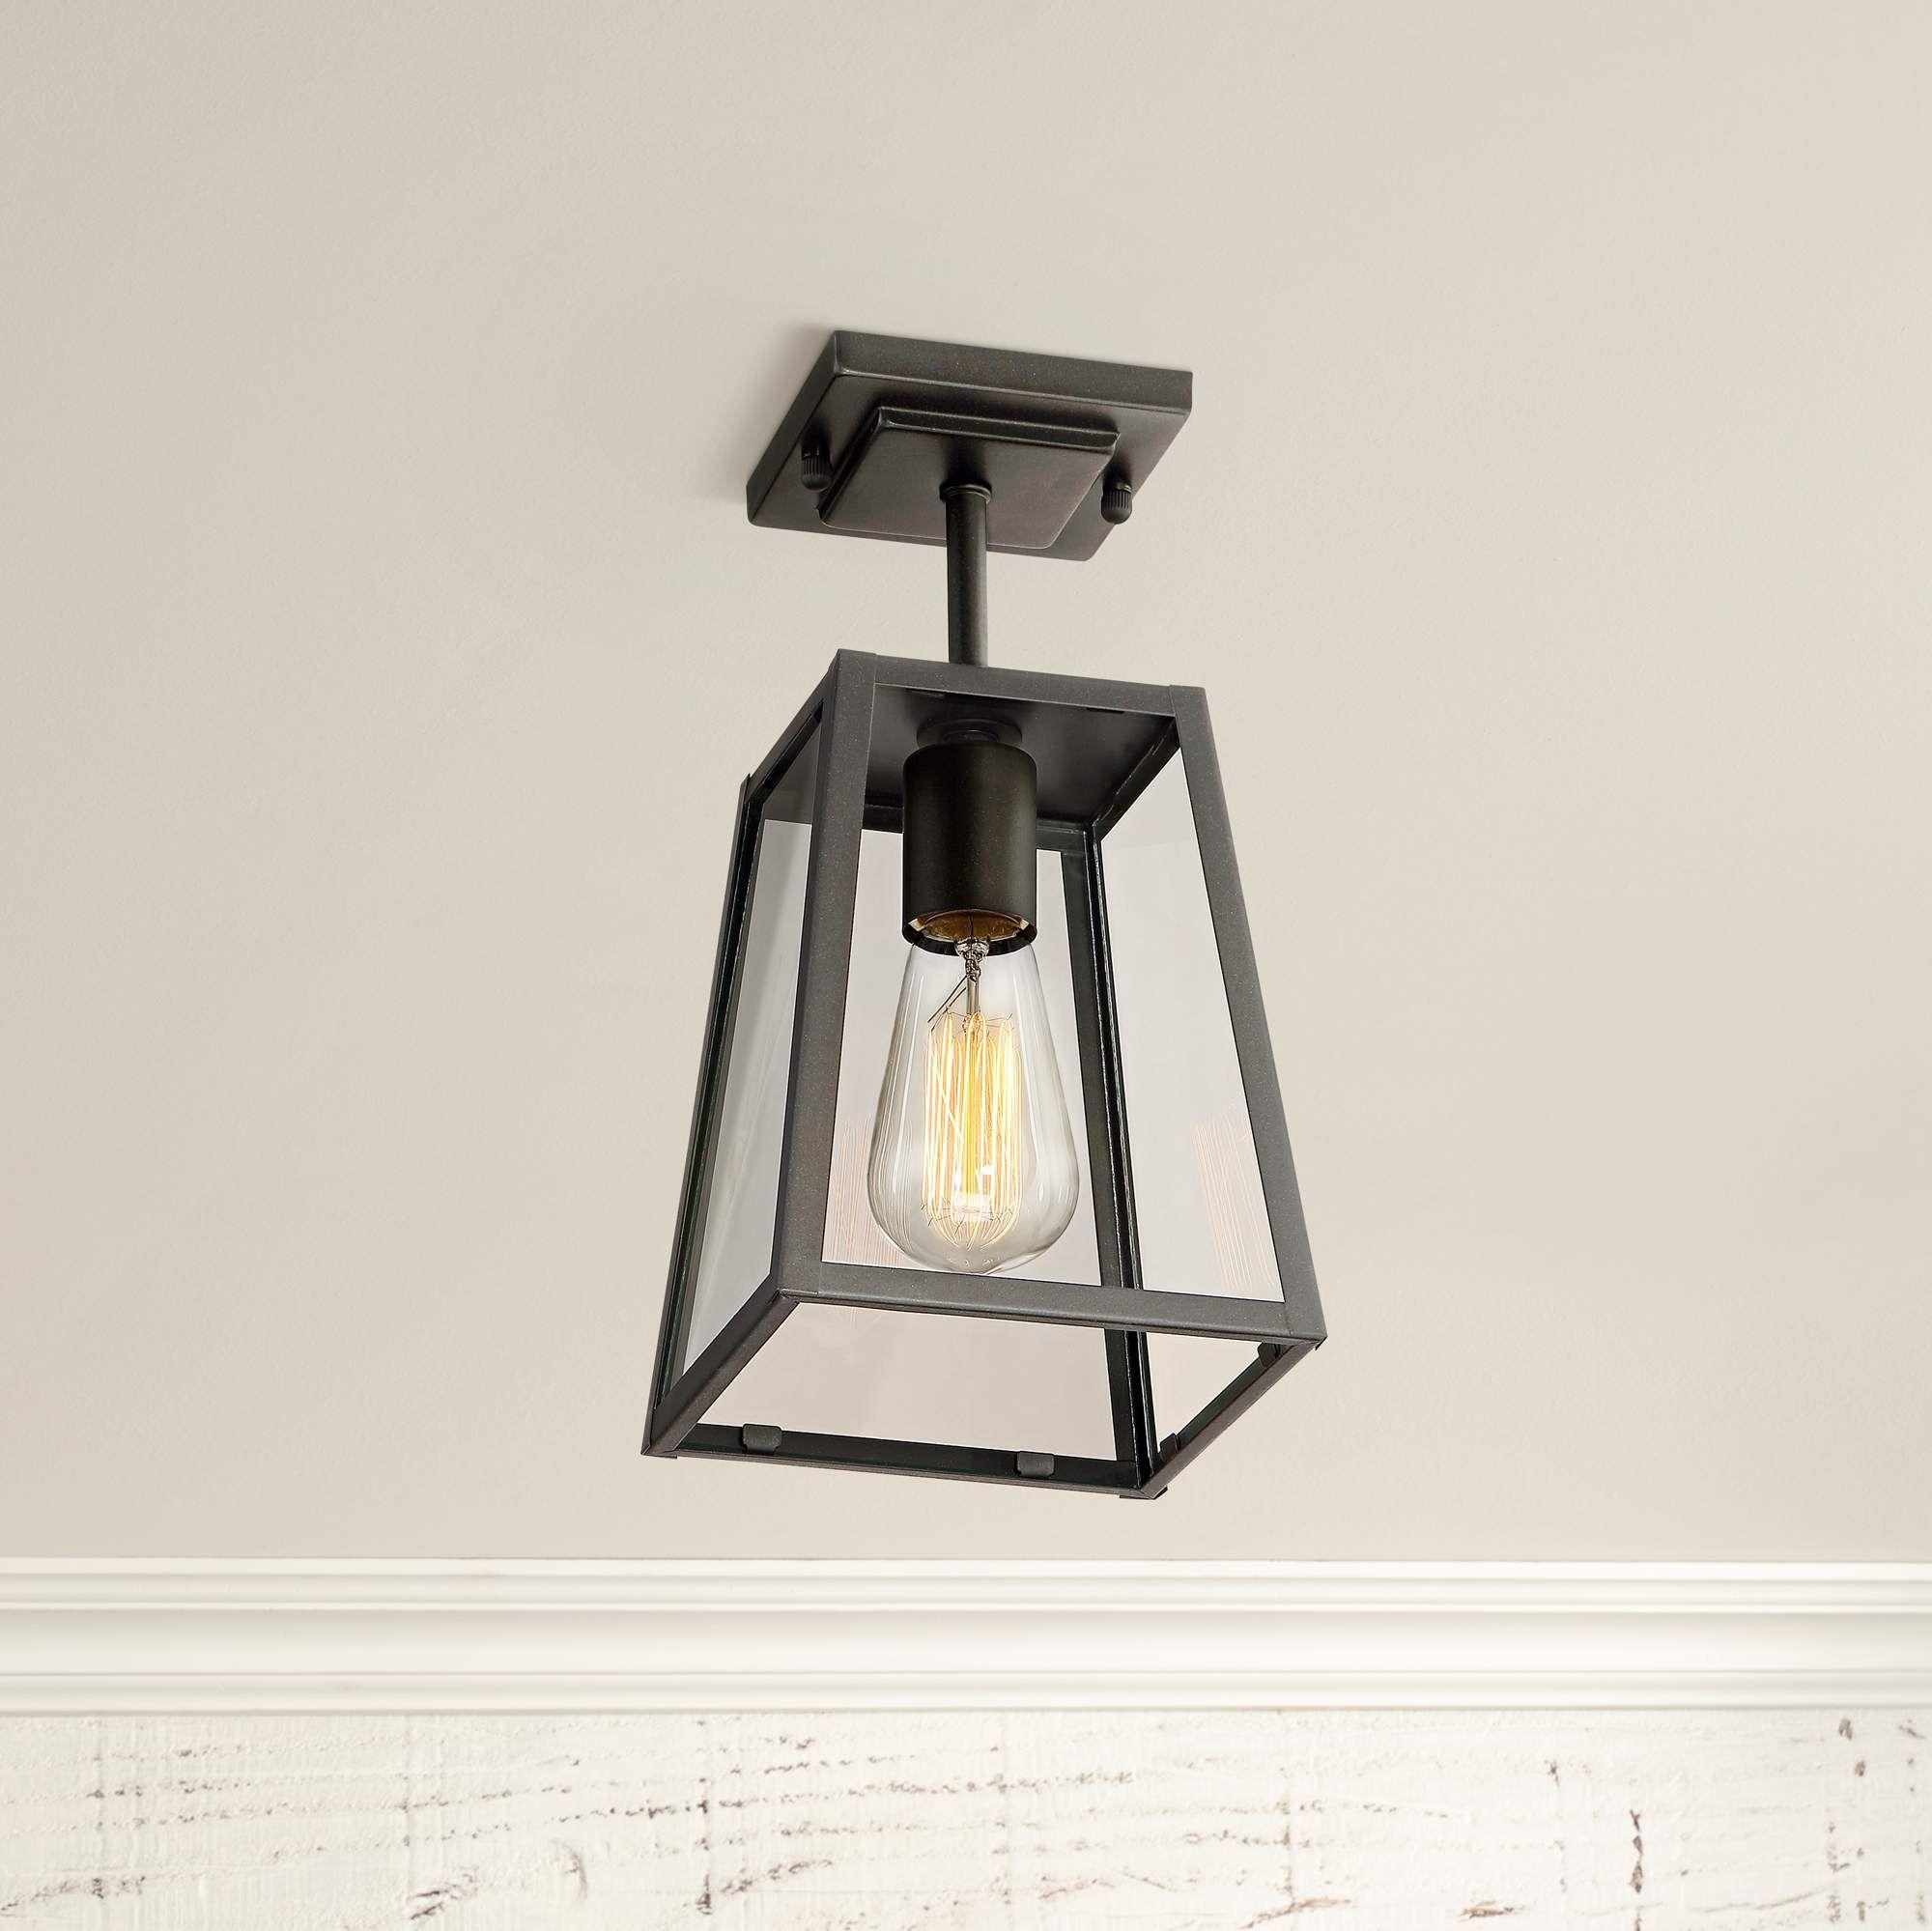 Arrington 6 Hallway Ceiling Lights Outdoor Black Fans